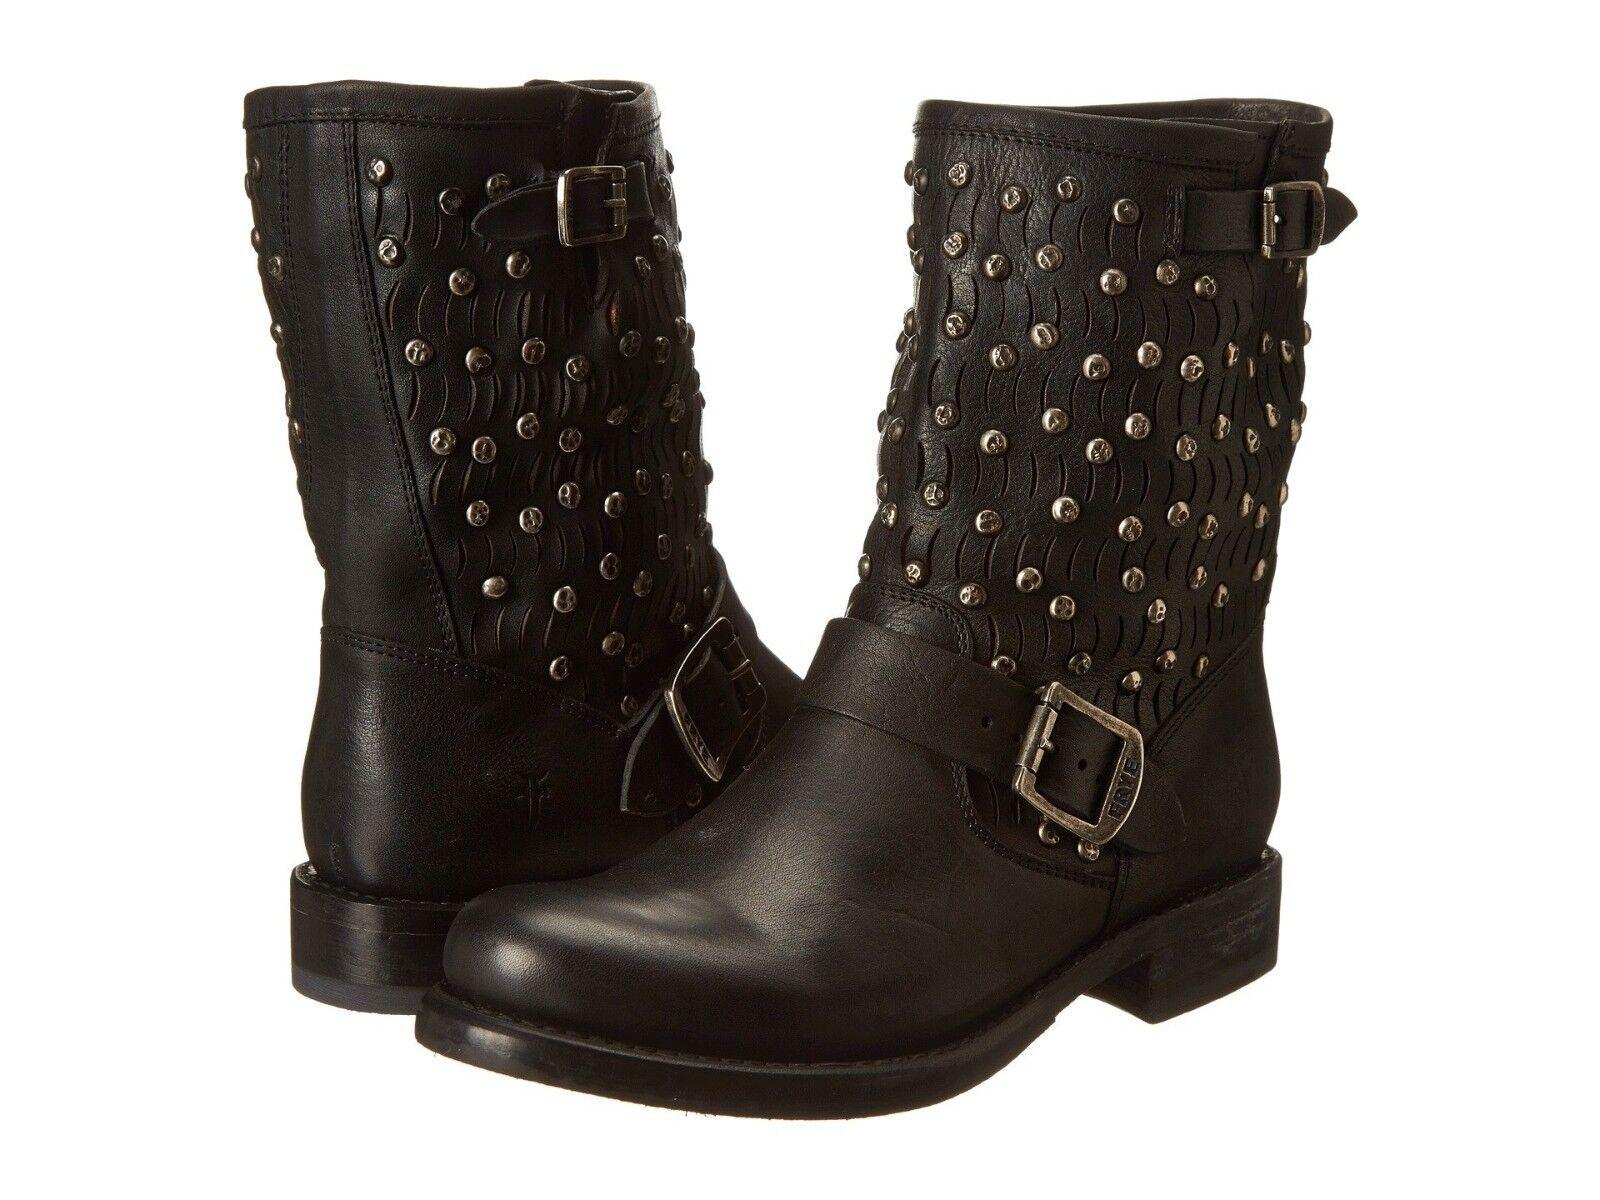 FRYE Jenna Cut Stud Short Moto Black Distressed Boot Size 6 - New in Box $428.00